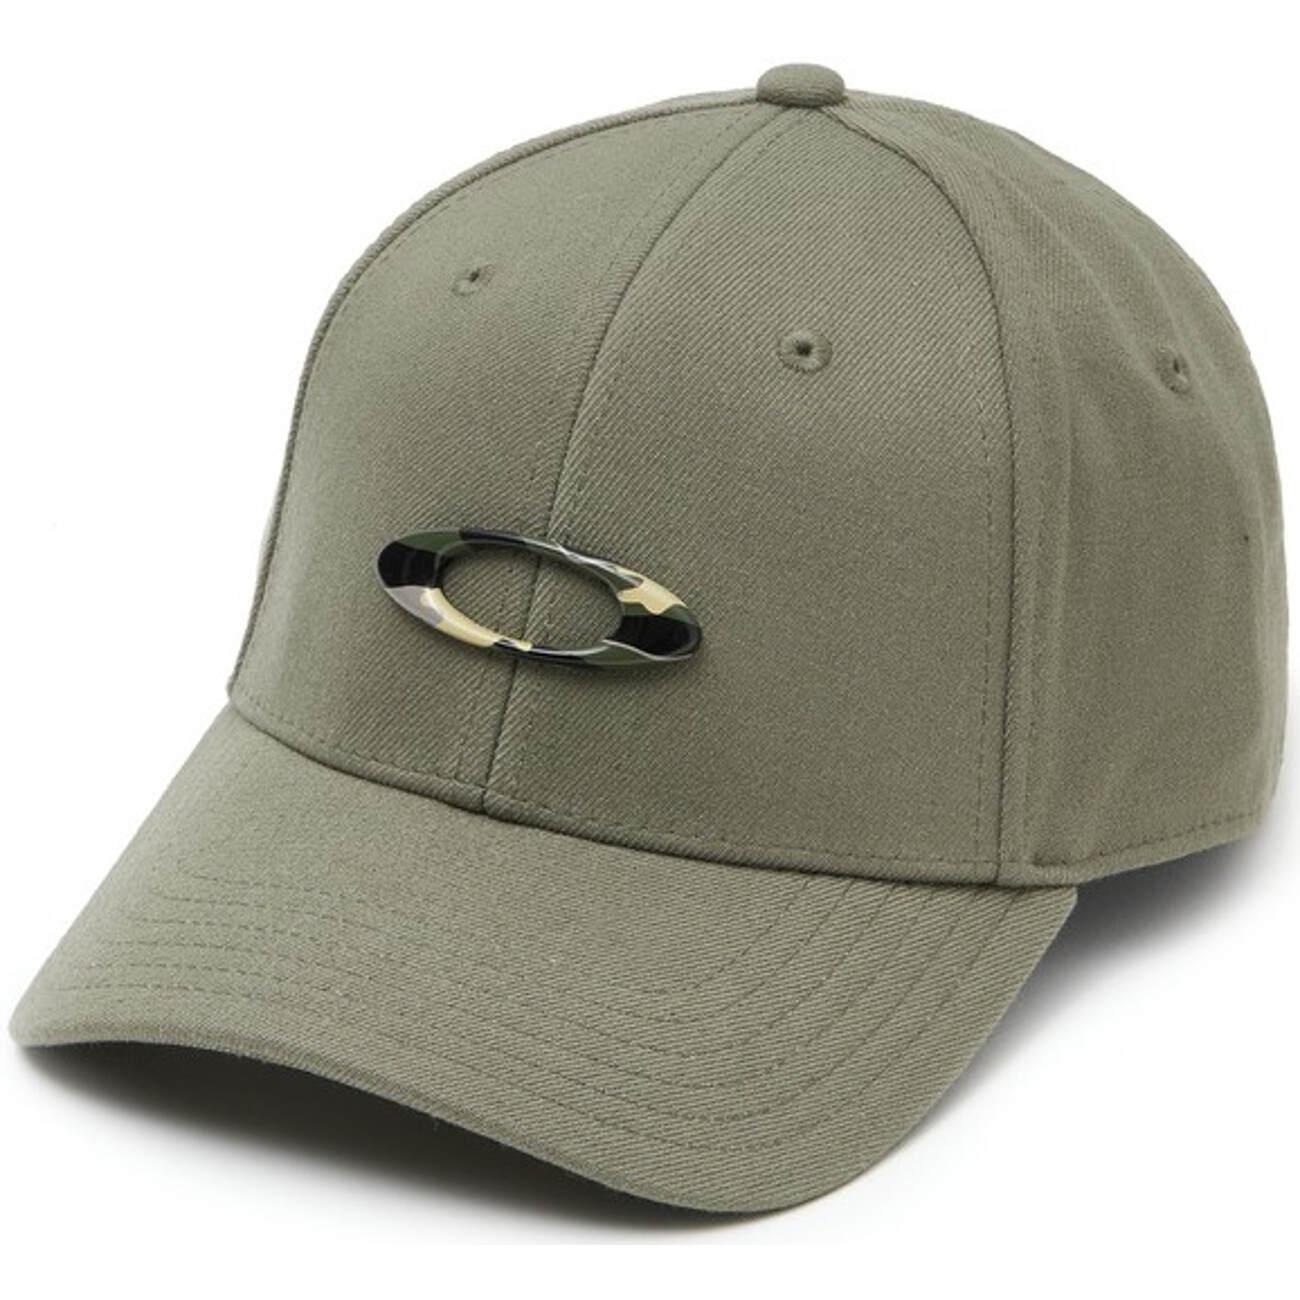 finest selection 22da0 f1226 ... usa oakley cap tincan worn olive graphic camo maciag offroad d111a 77b0a